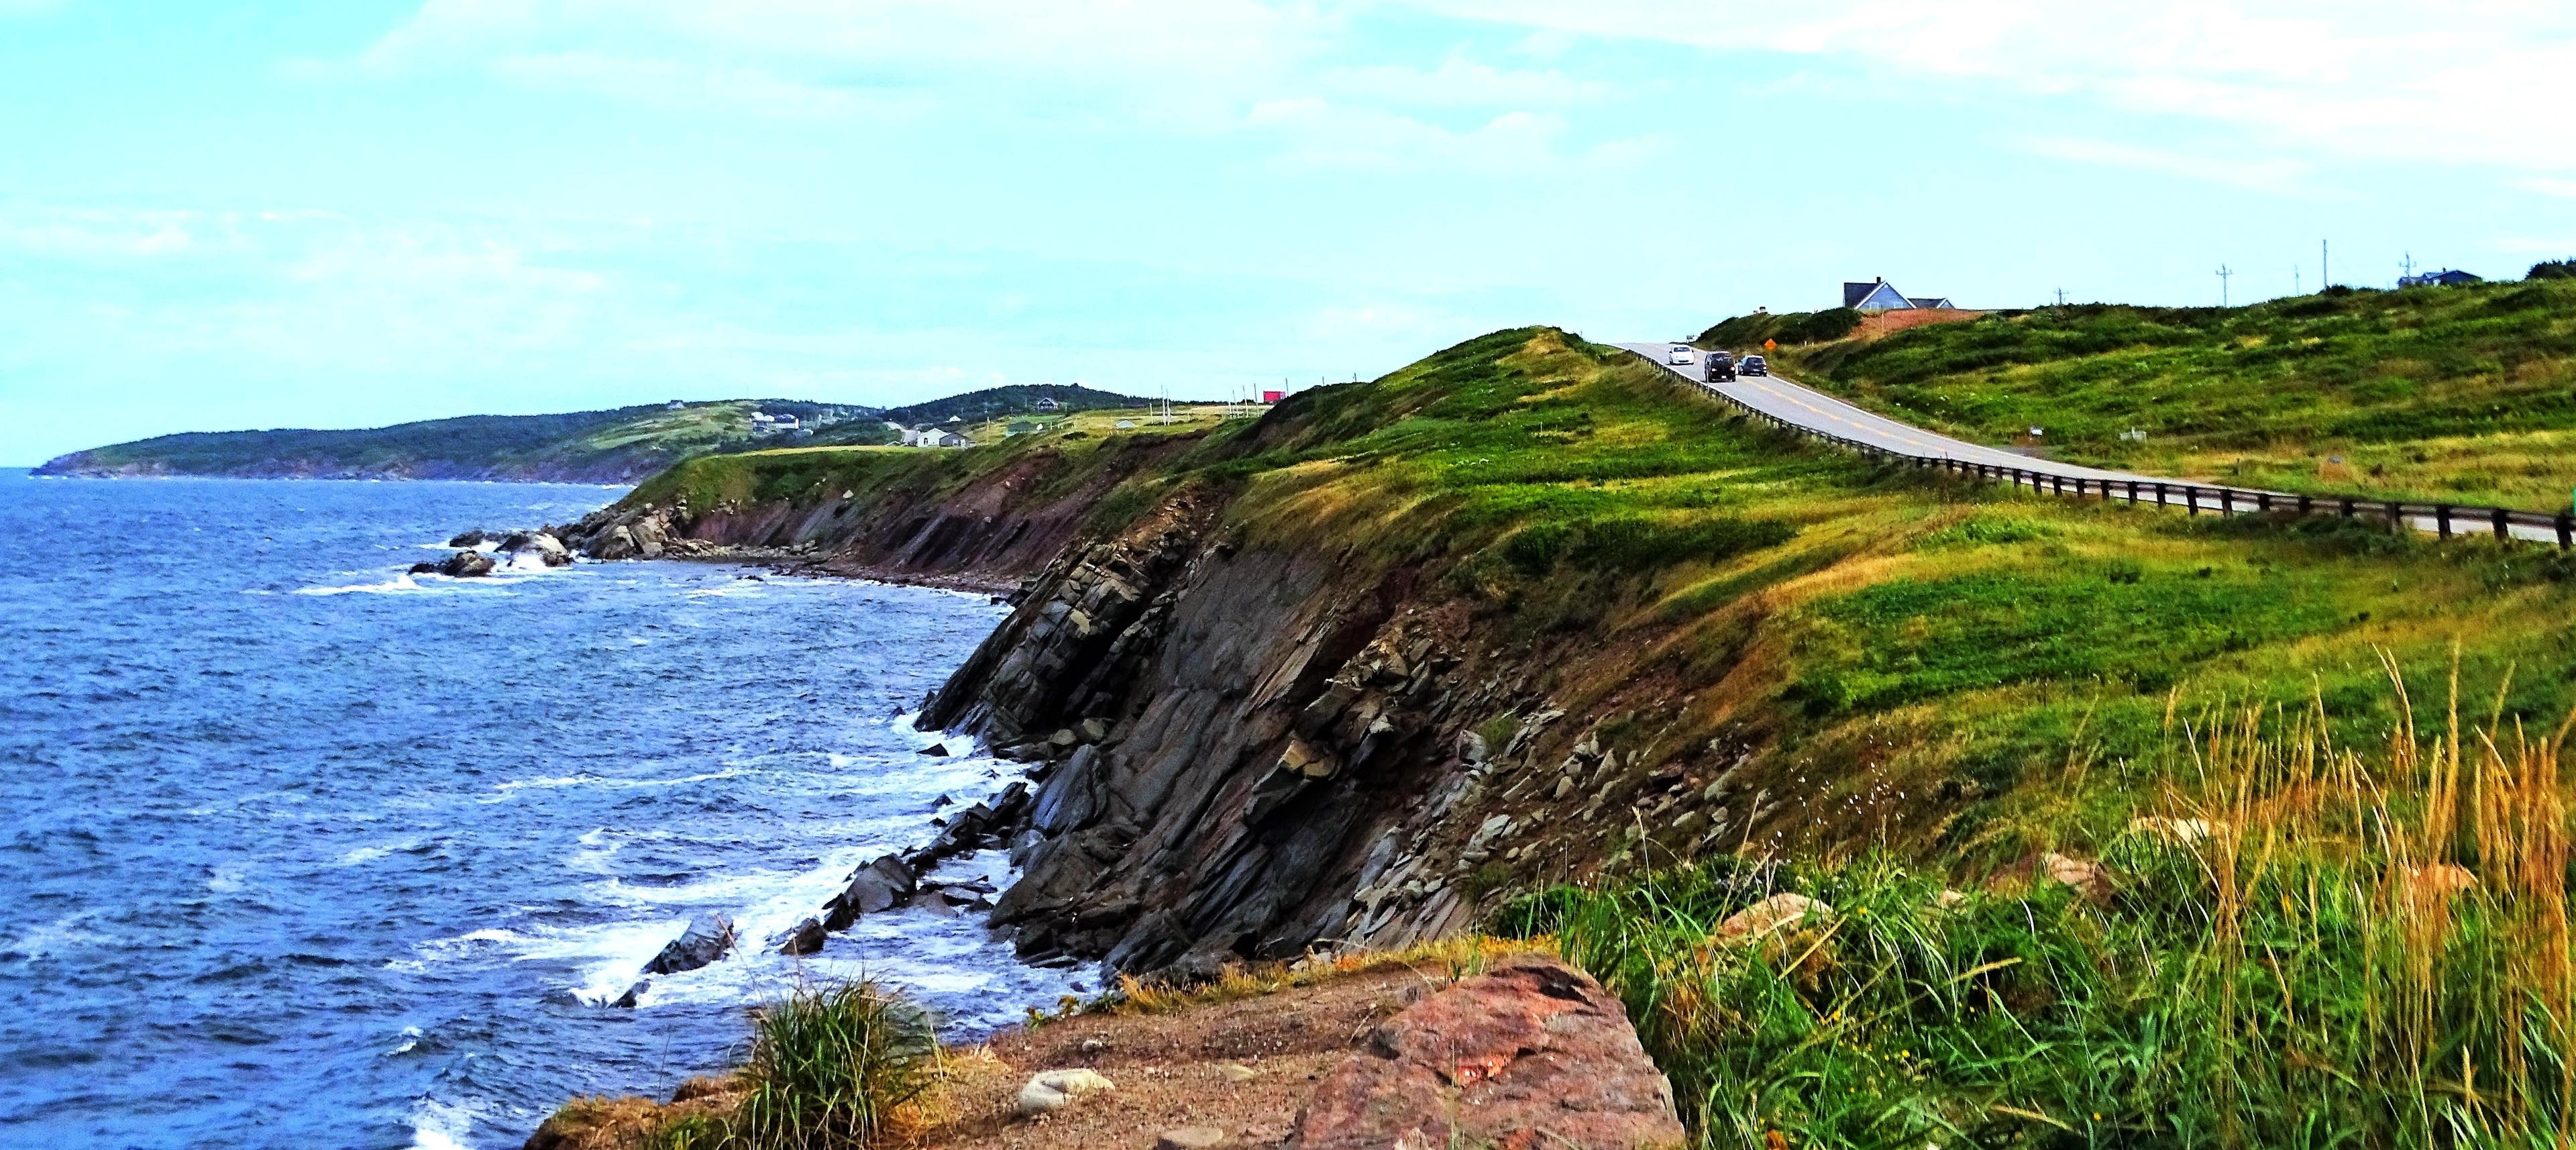 Cornwall, Prince Edward Island, Canada